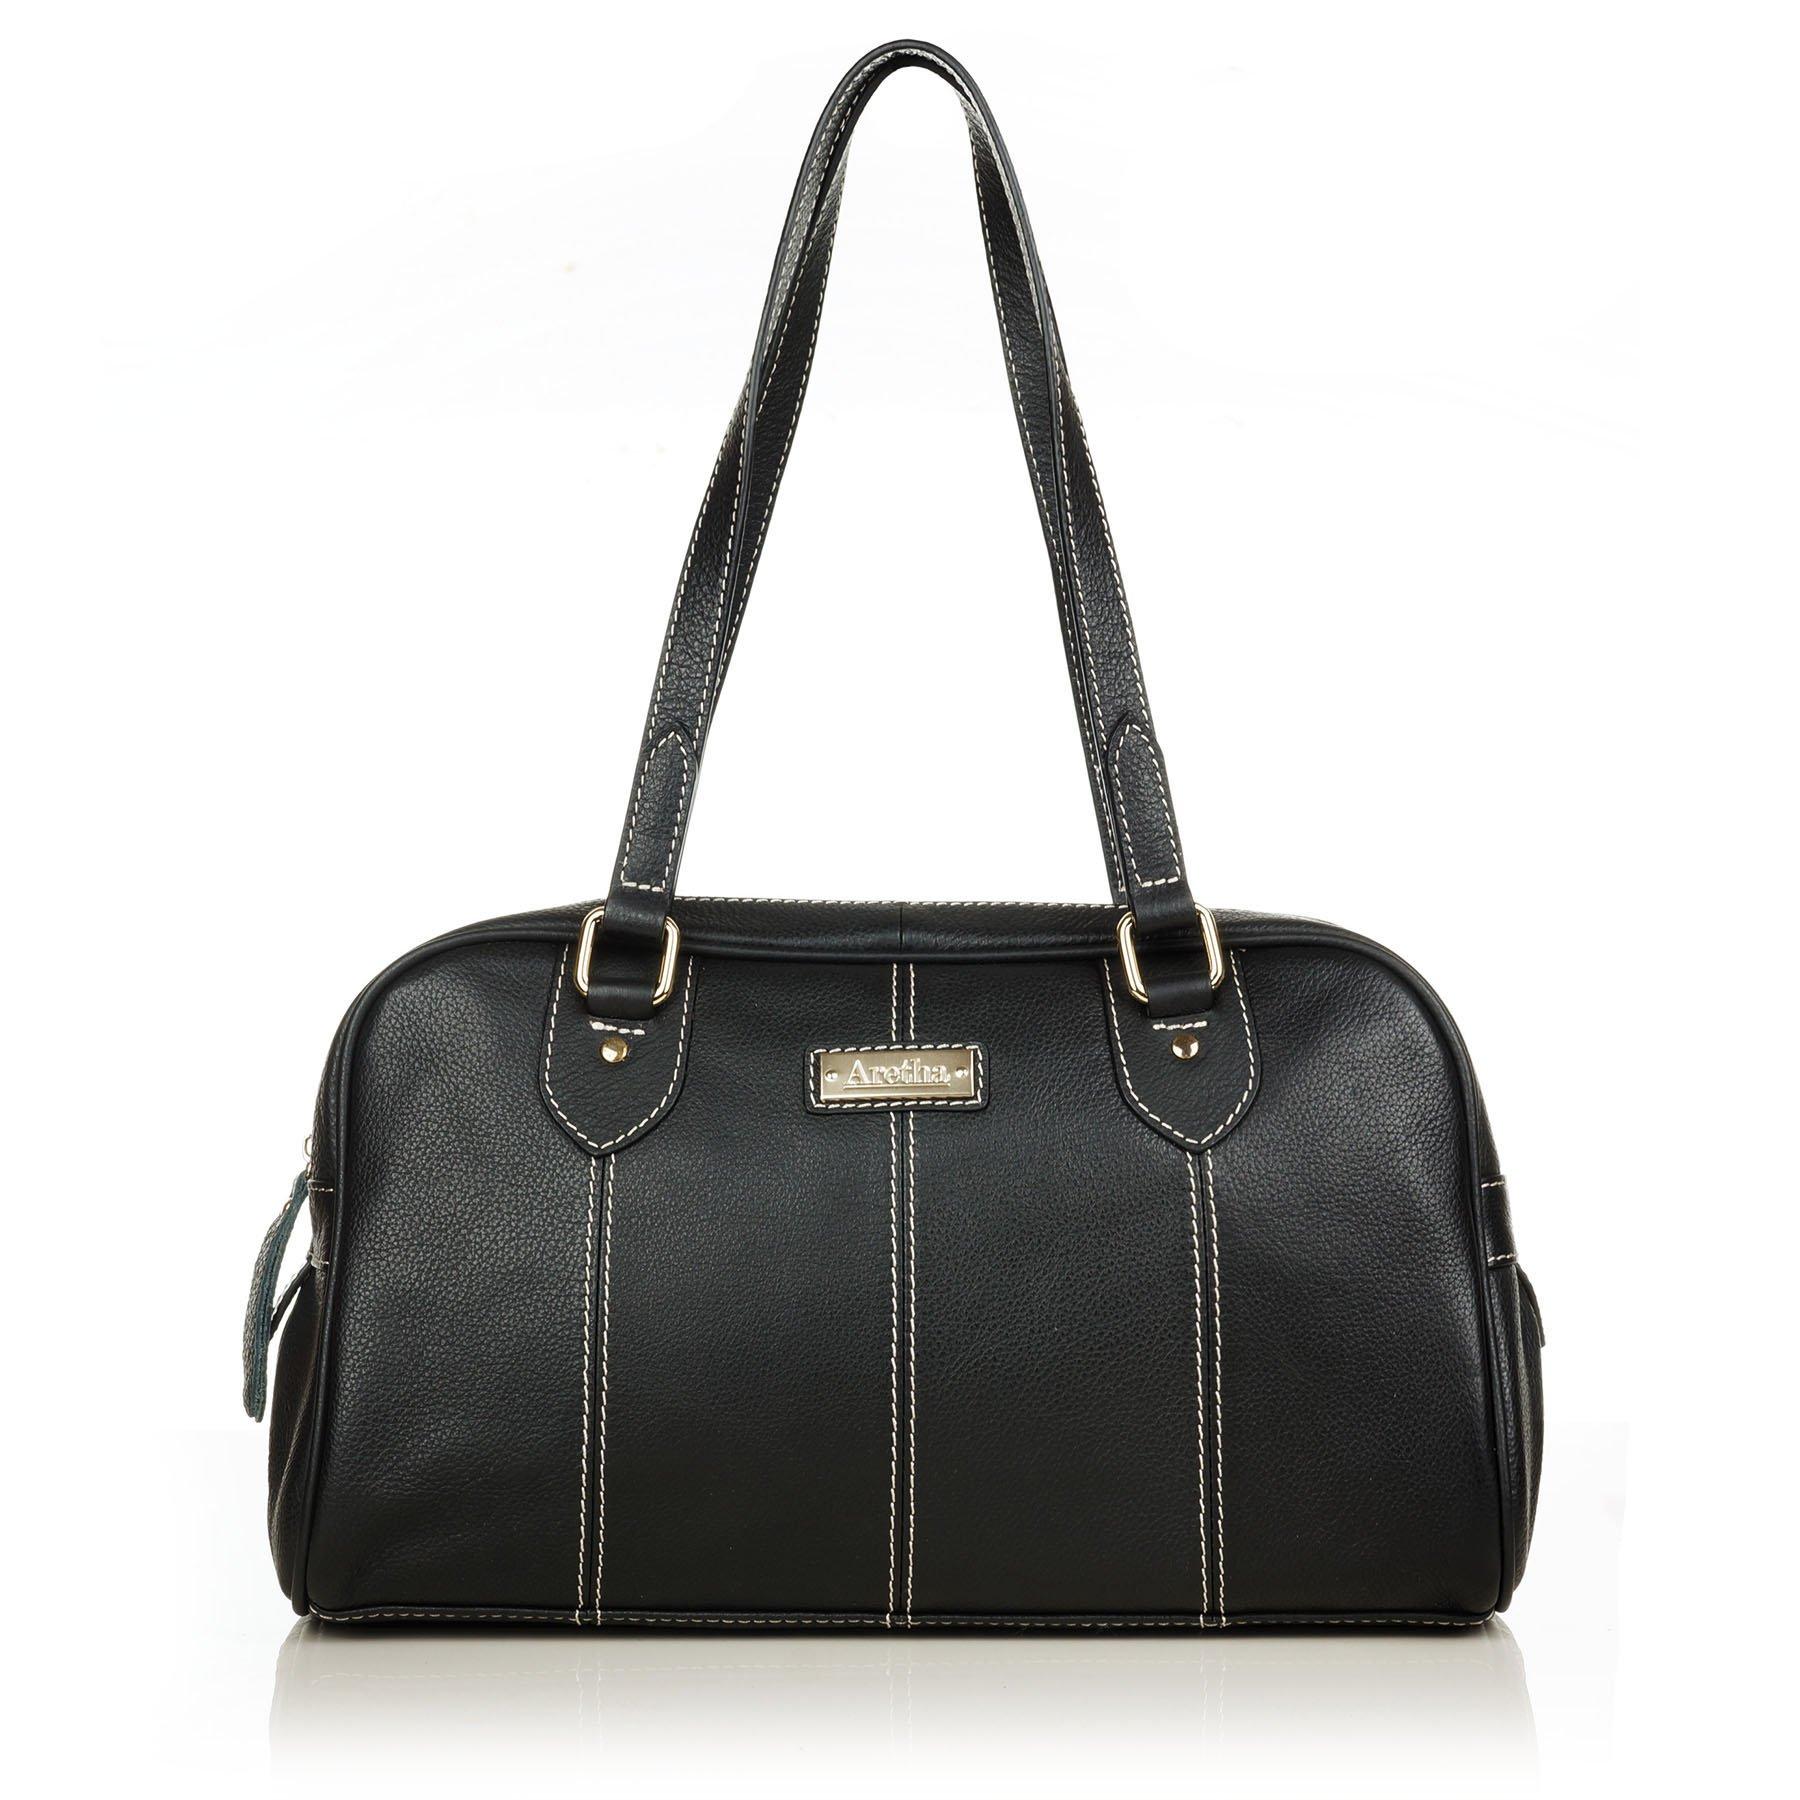 aretha 141281-BL Sporty Women Genuine Cowhide Leather Shoulder Tote Handbag Black